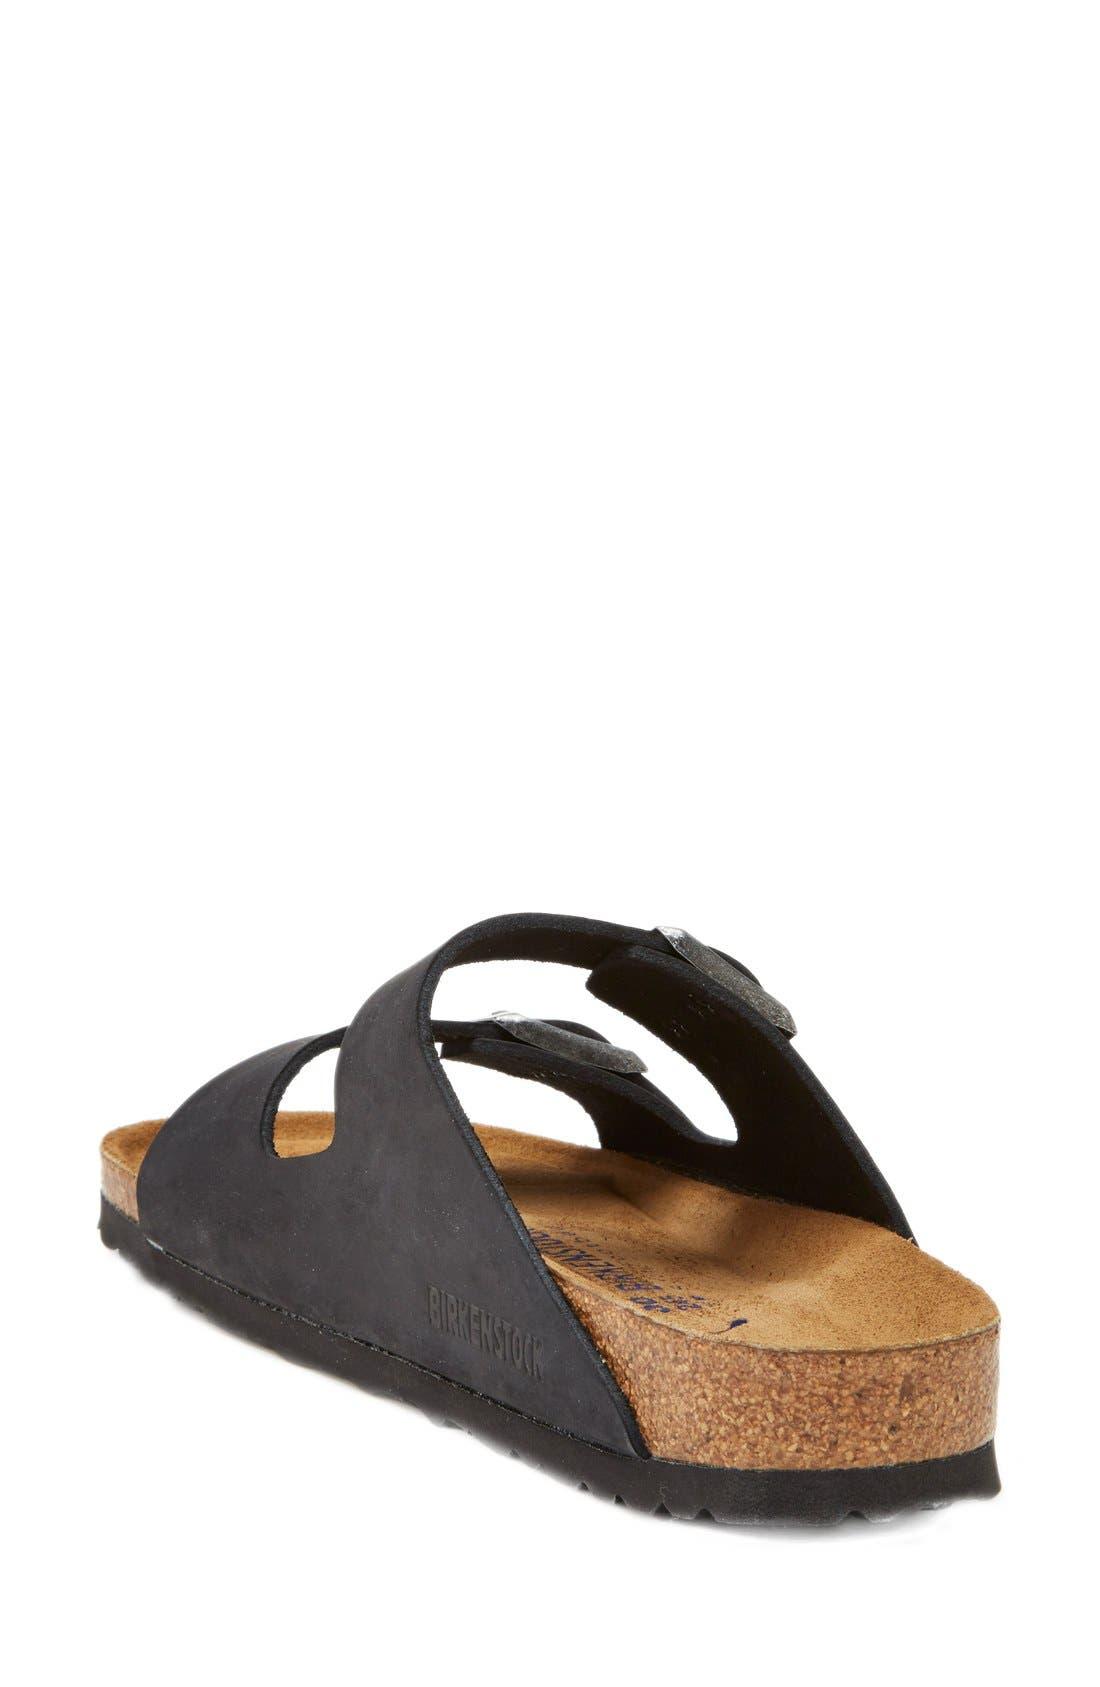 'Arizona' Soft Footbed Sandal,                             Alternate thumbnail 7, color,                             BLACK/ BLACK